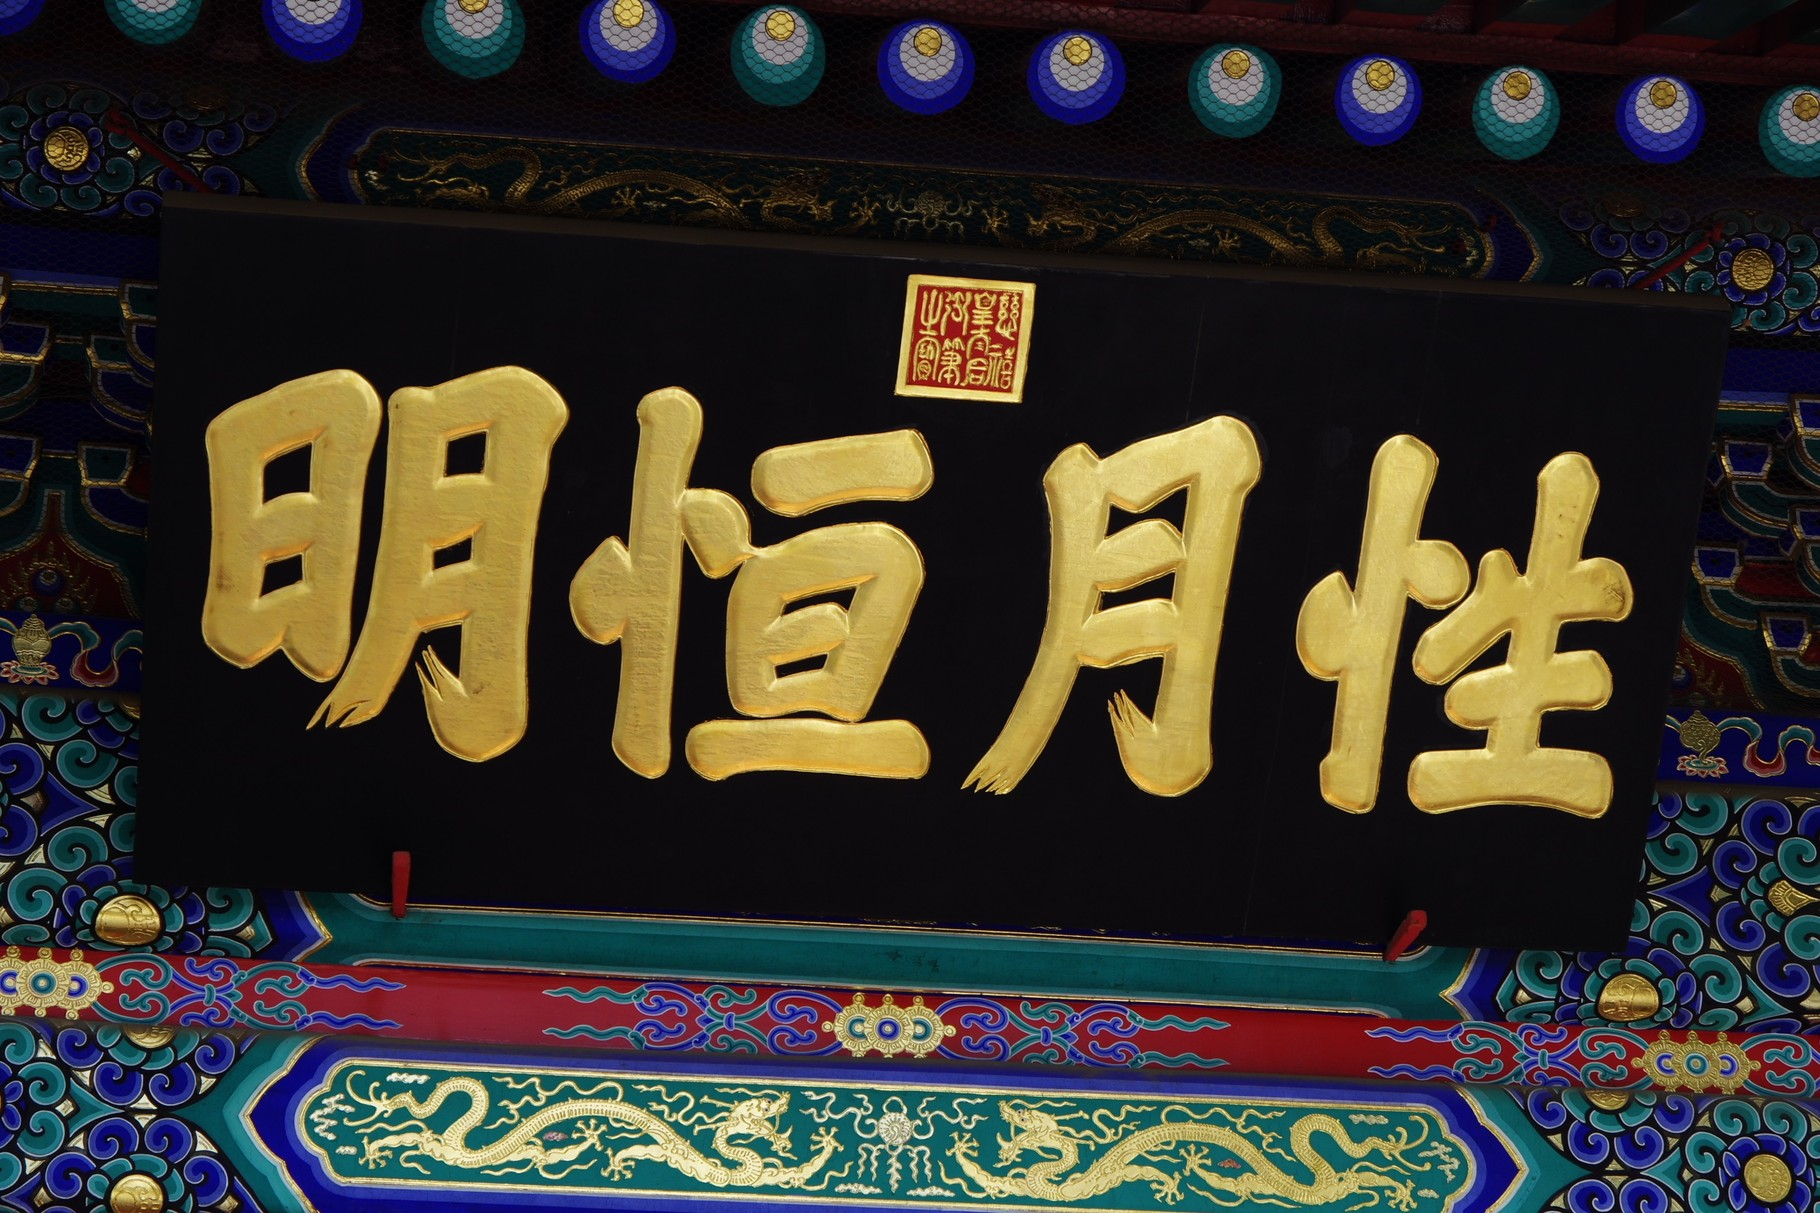 乾隆帝直筆「性月恒明」の扁額